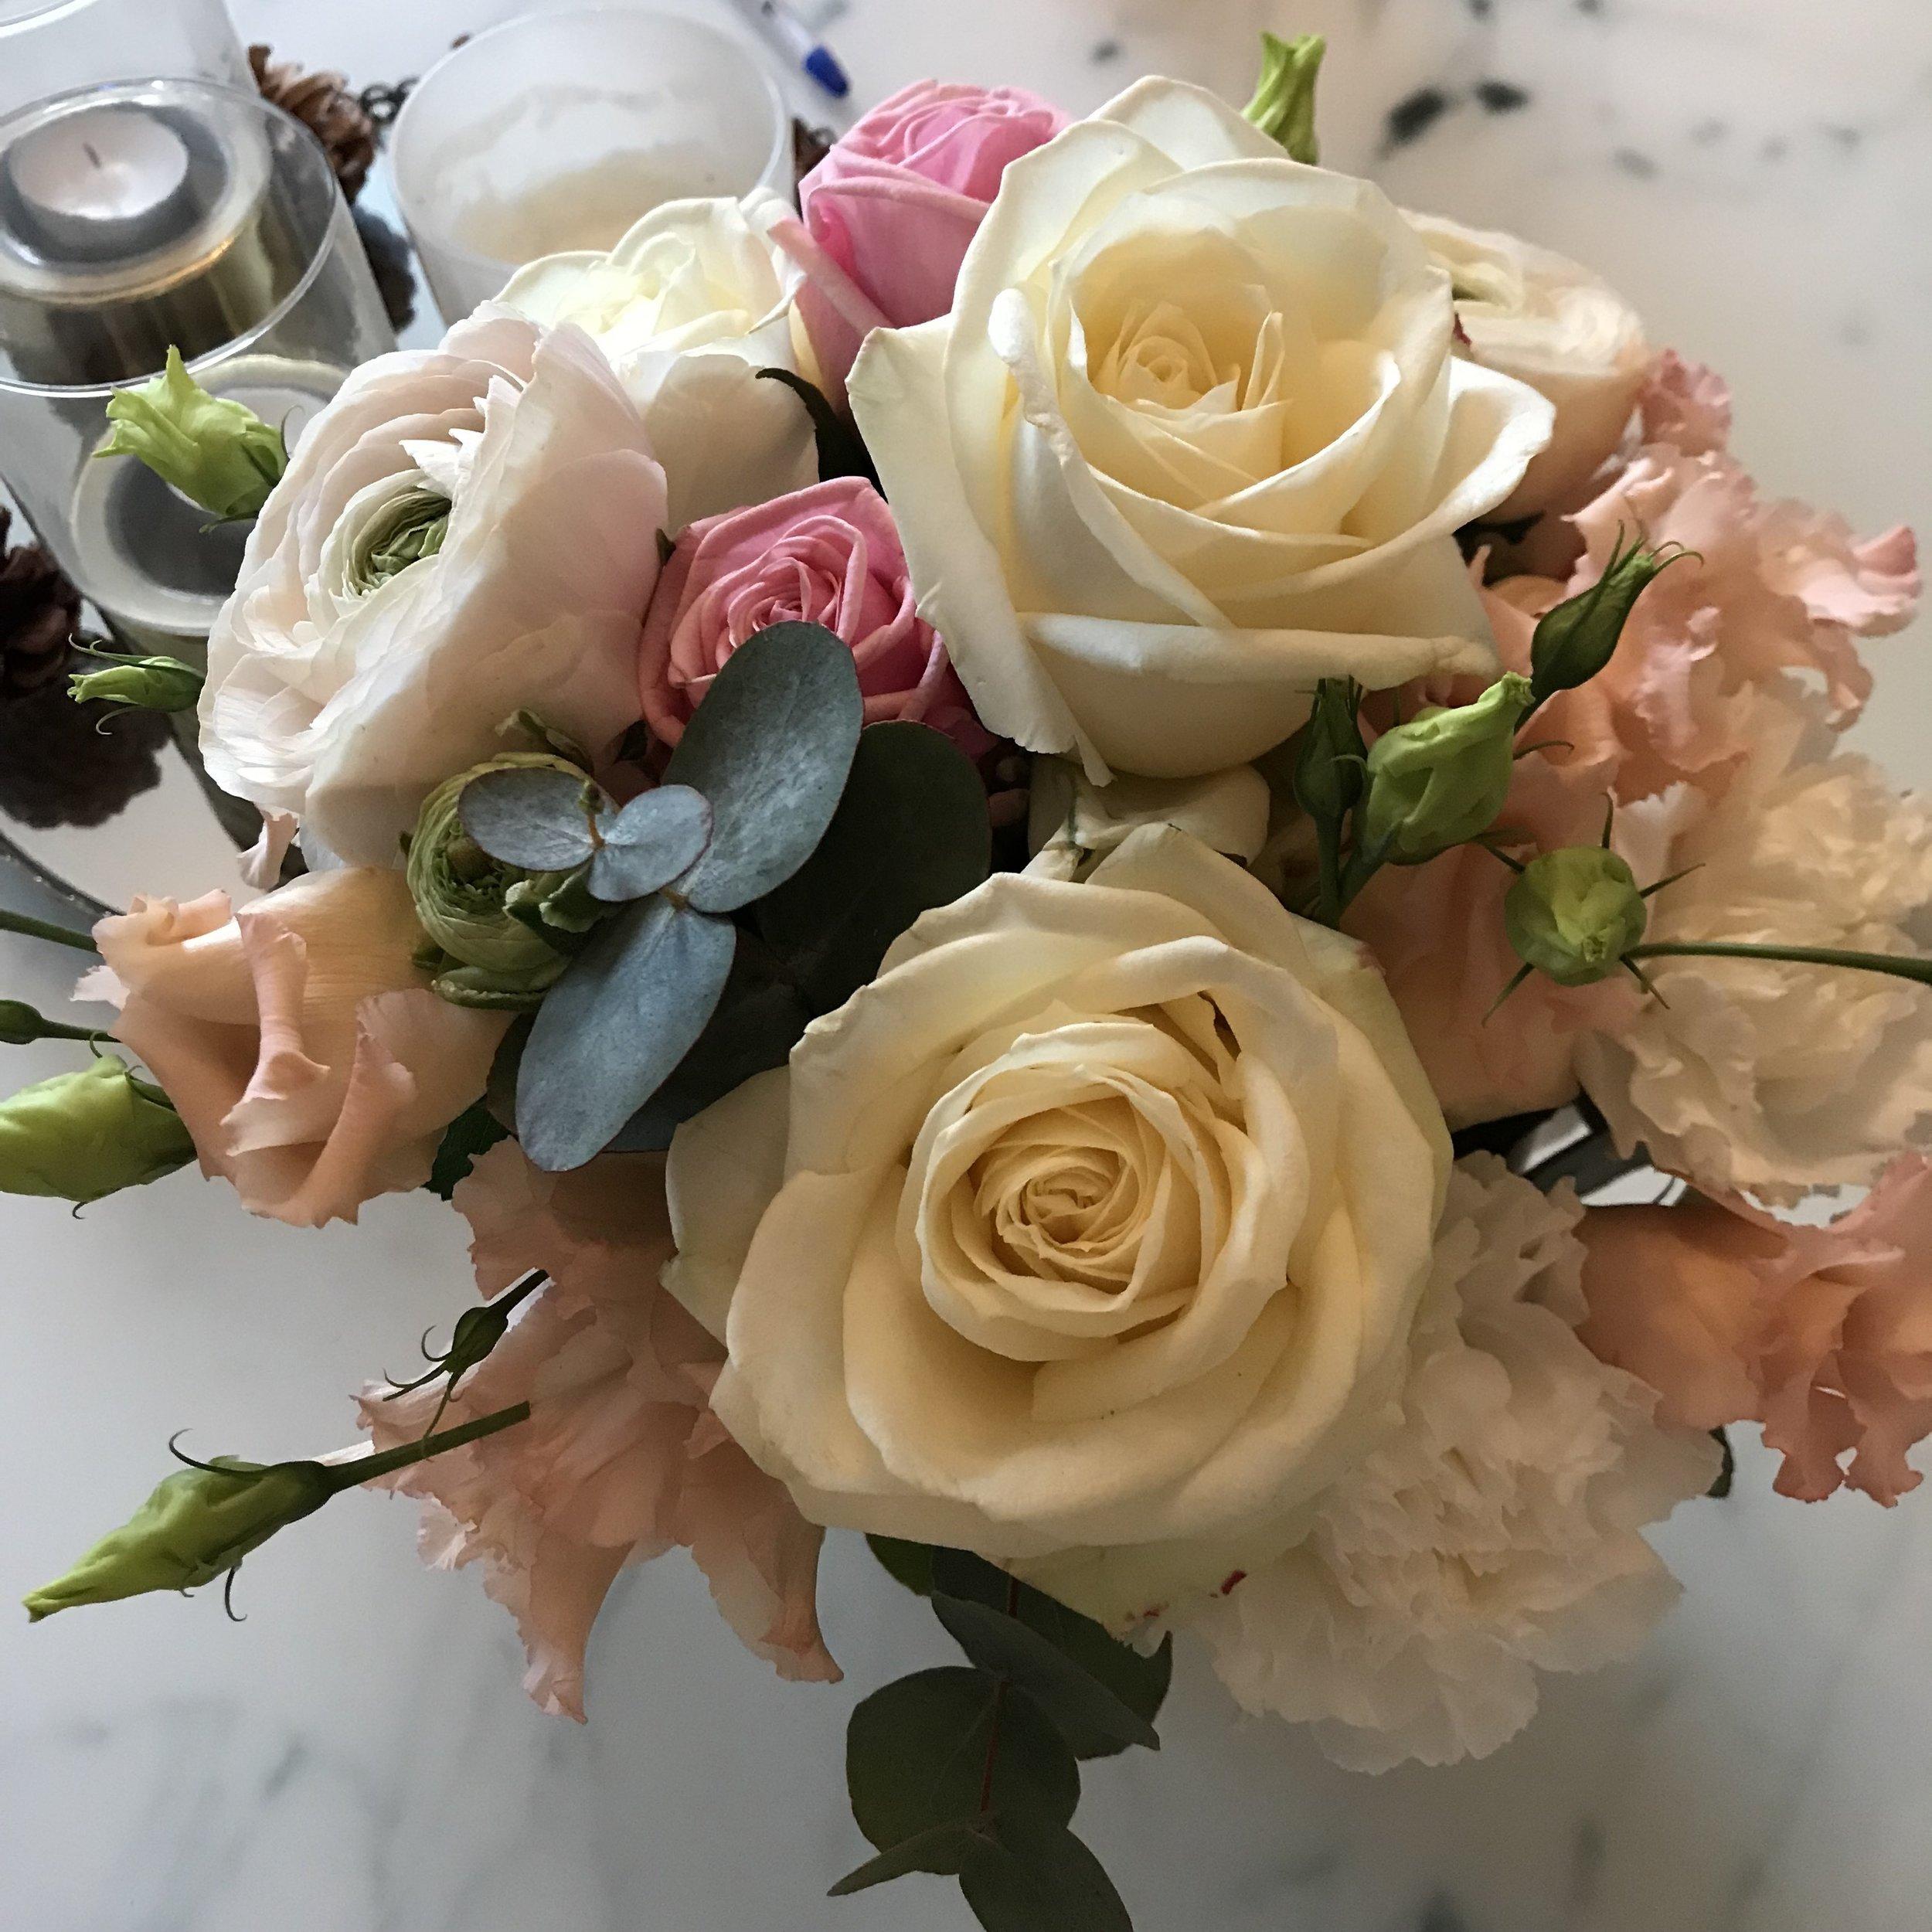 Blombukett med rosor